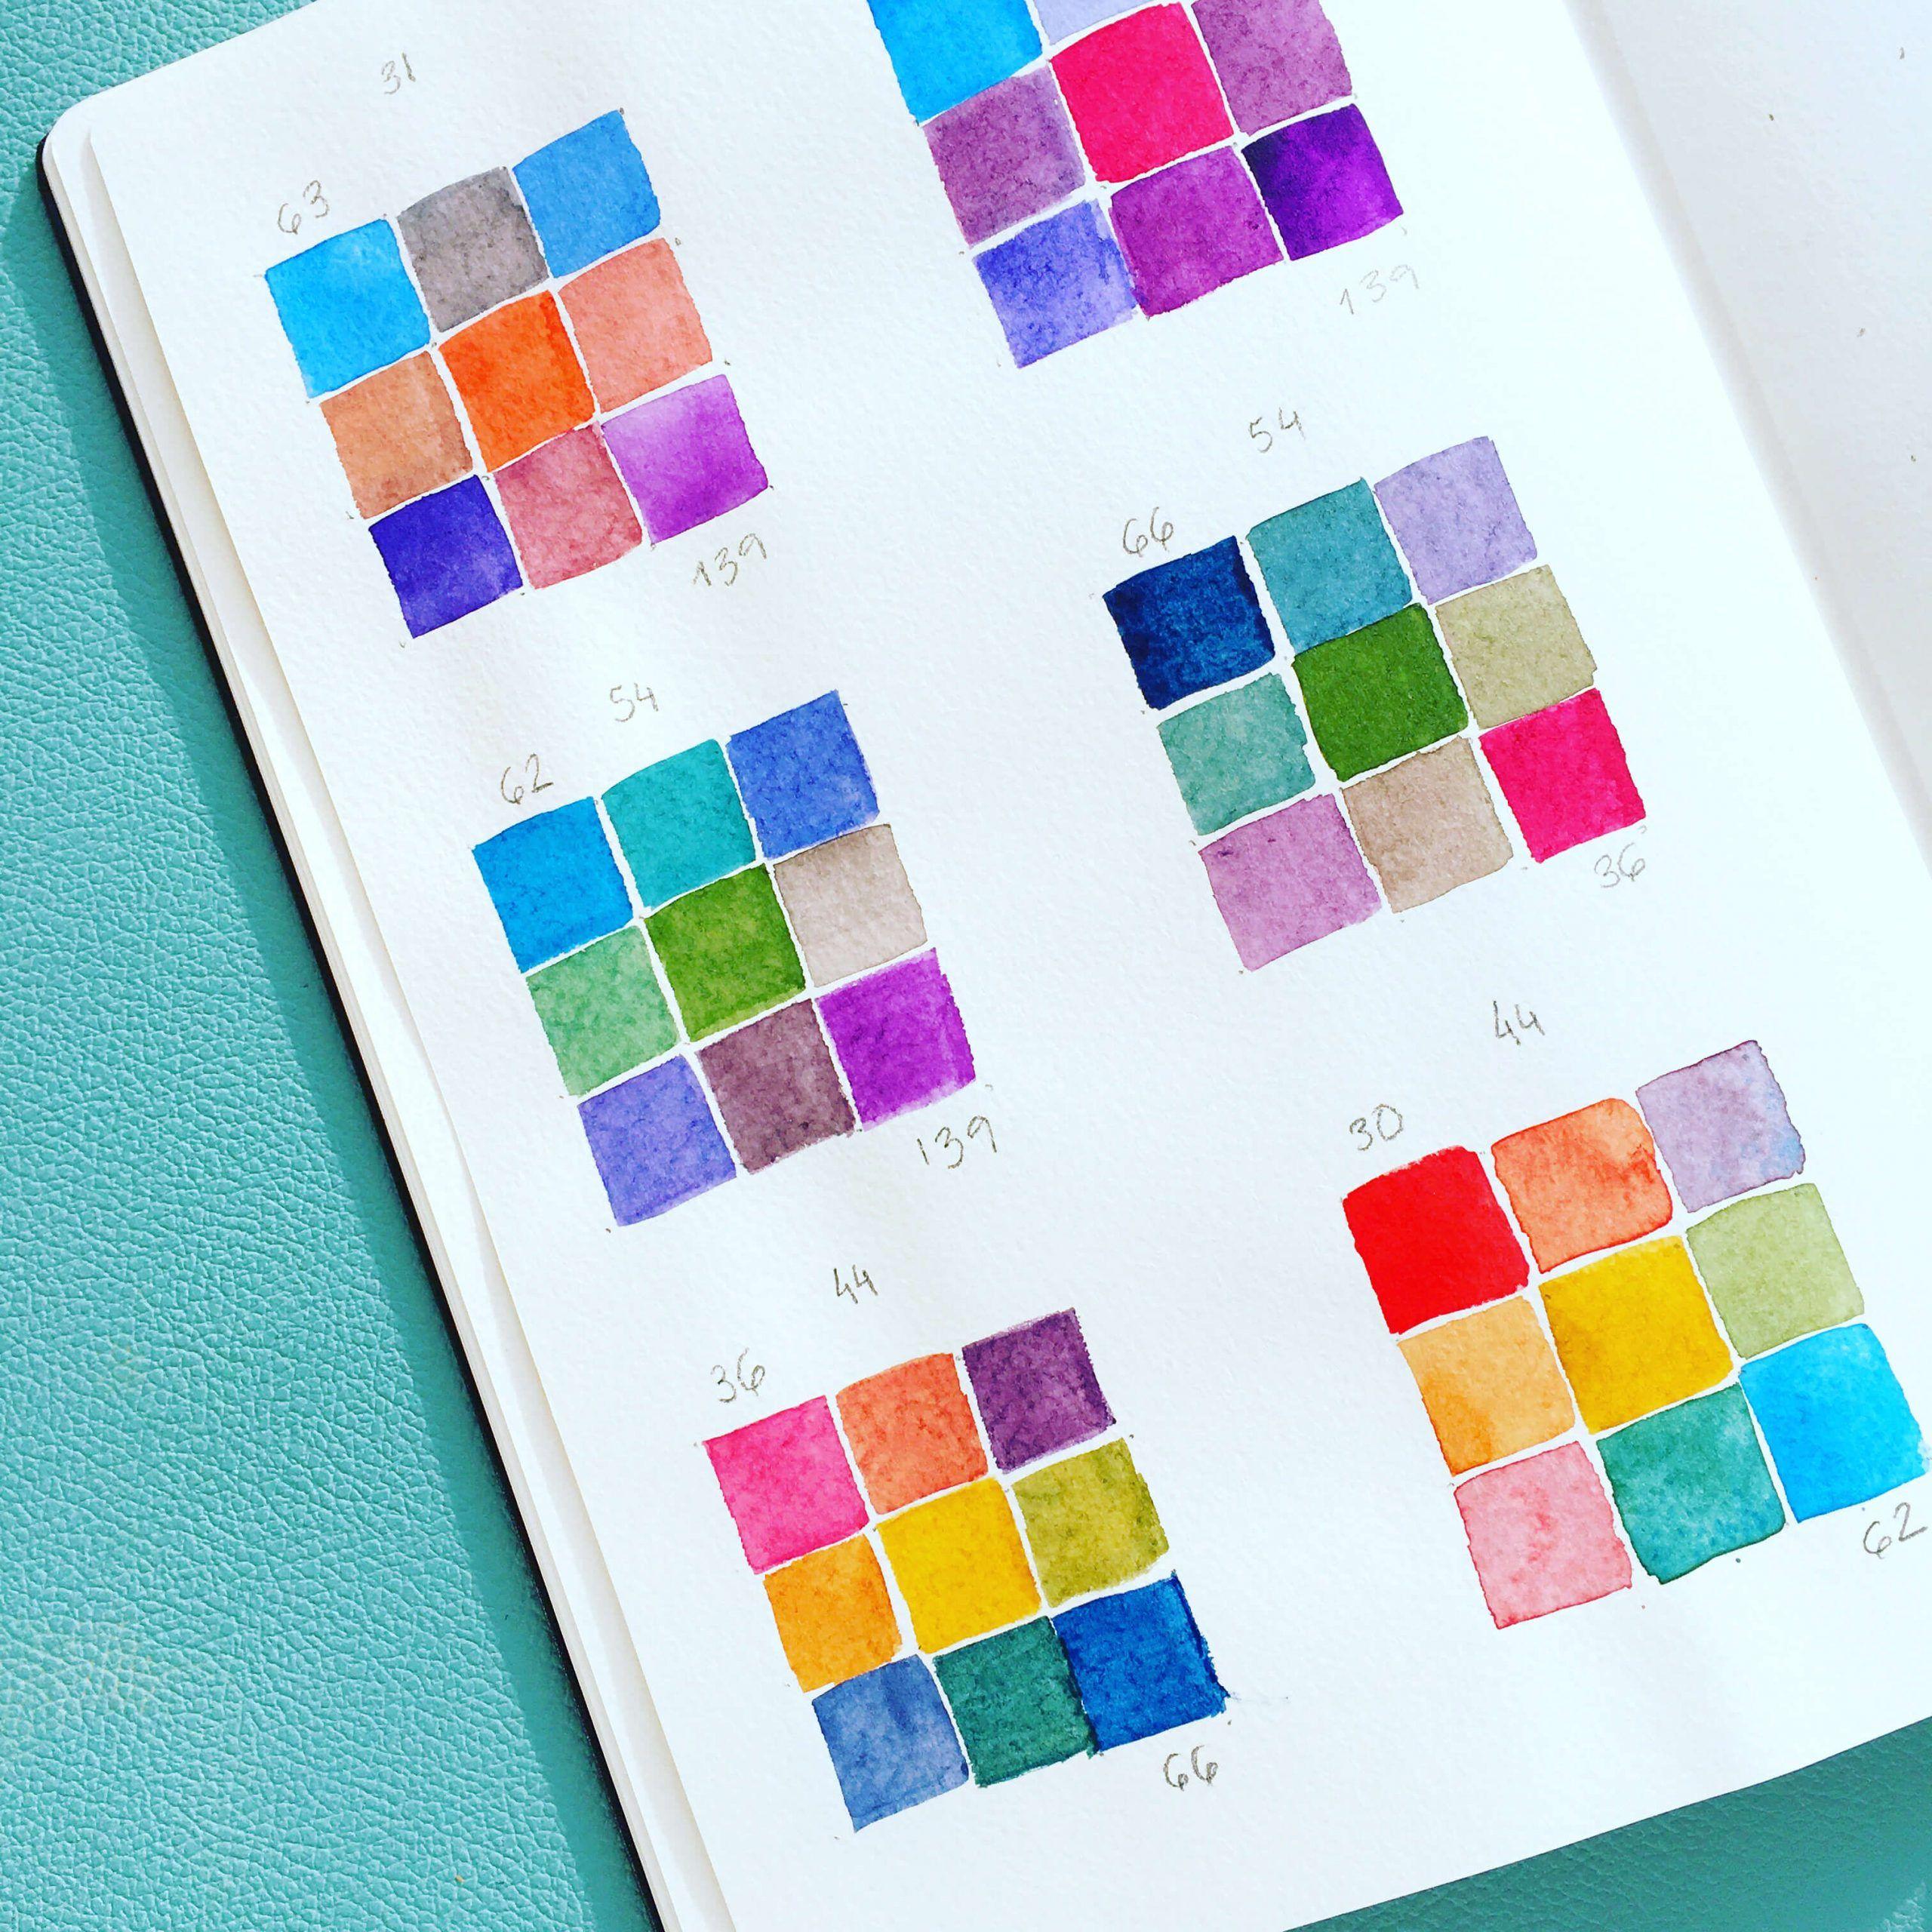 combina-colores-de-acuarela-principiantes